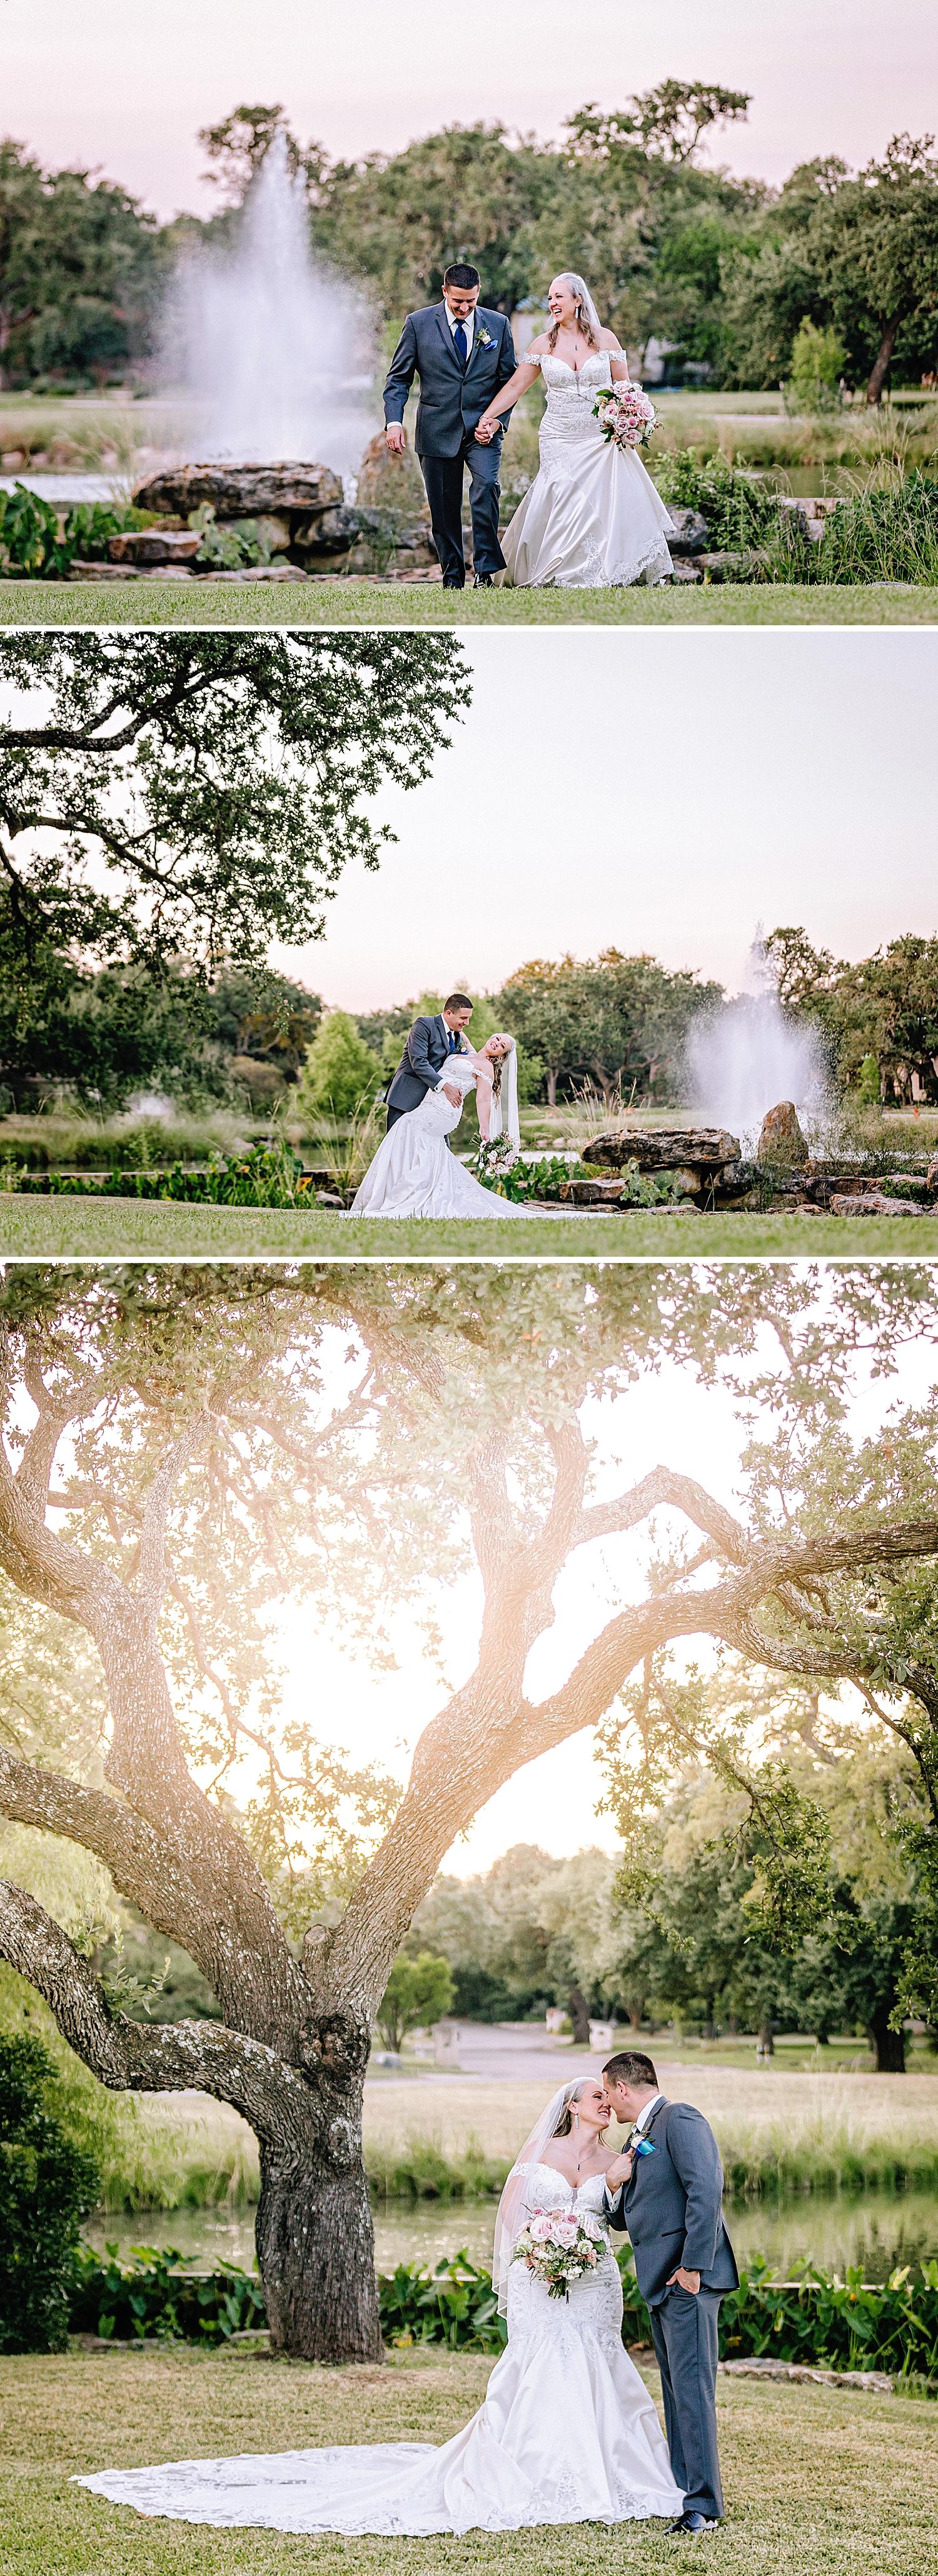 The-Club-at-Garden-Ridge-Military-Wedding-Carly-Barton-Photography_0051.jpg